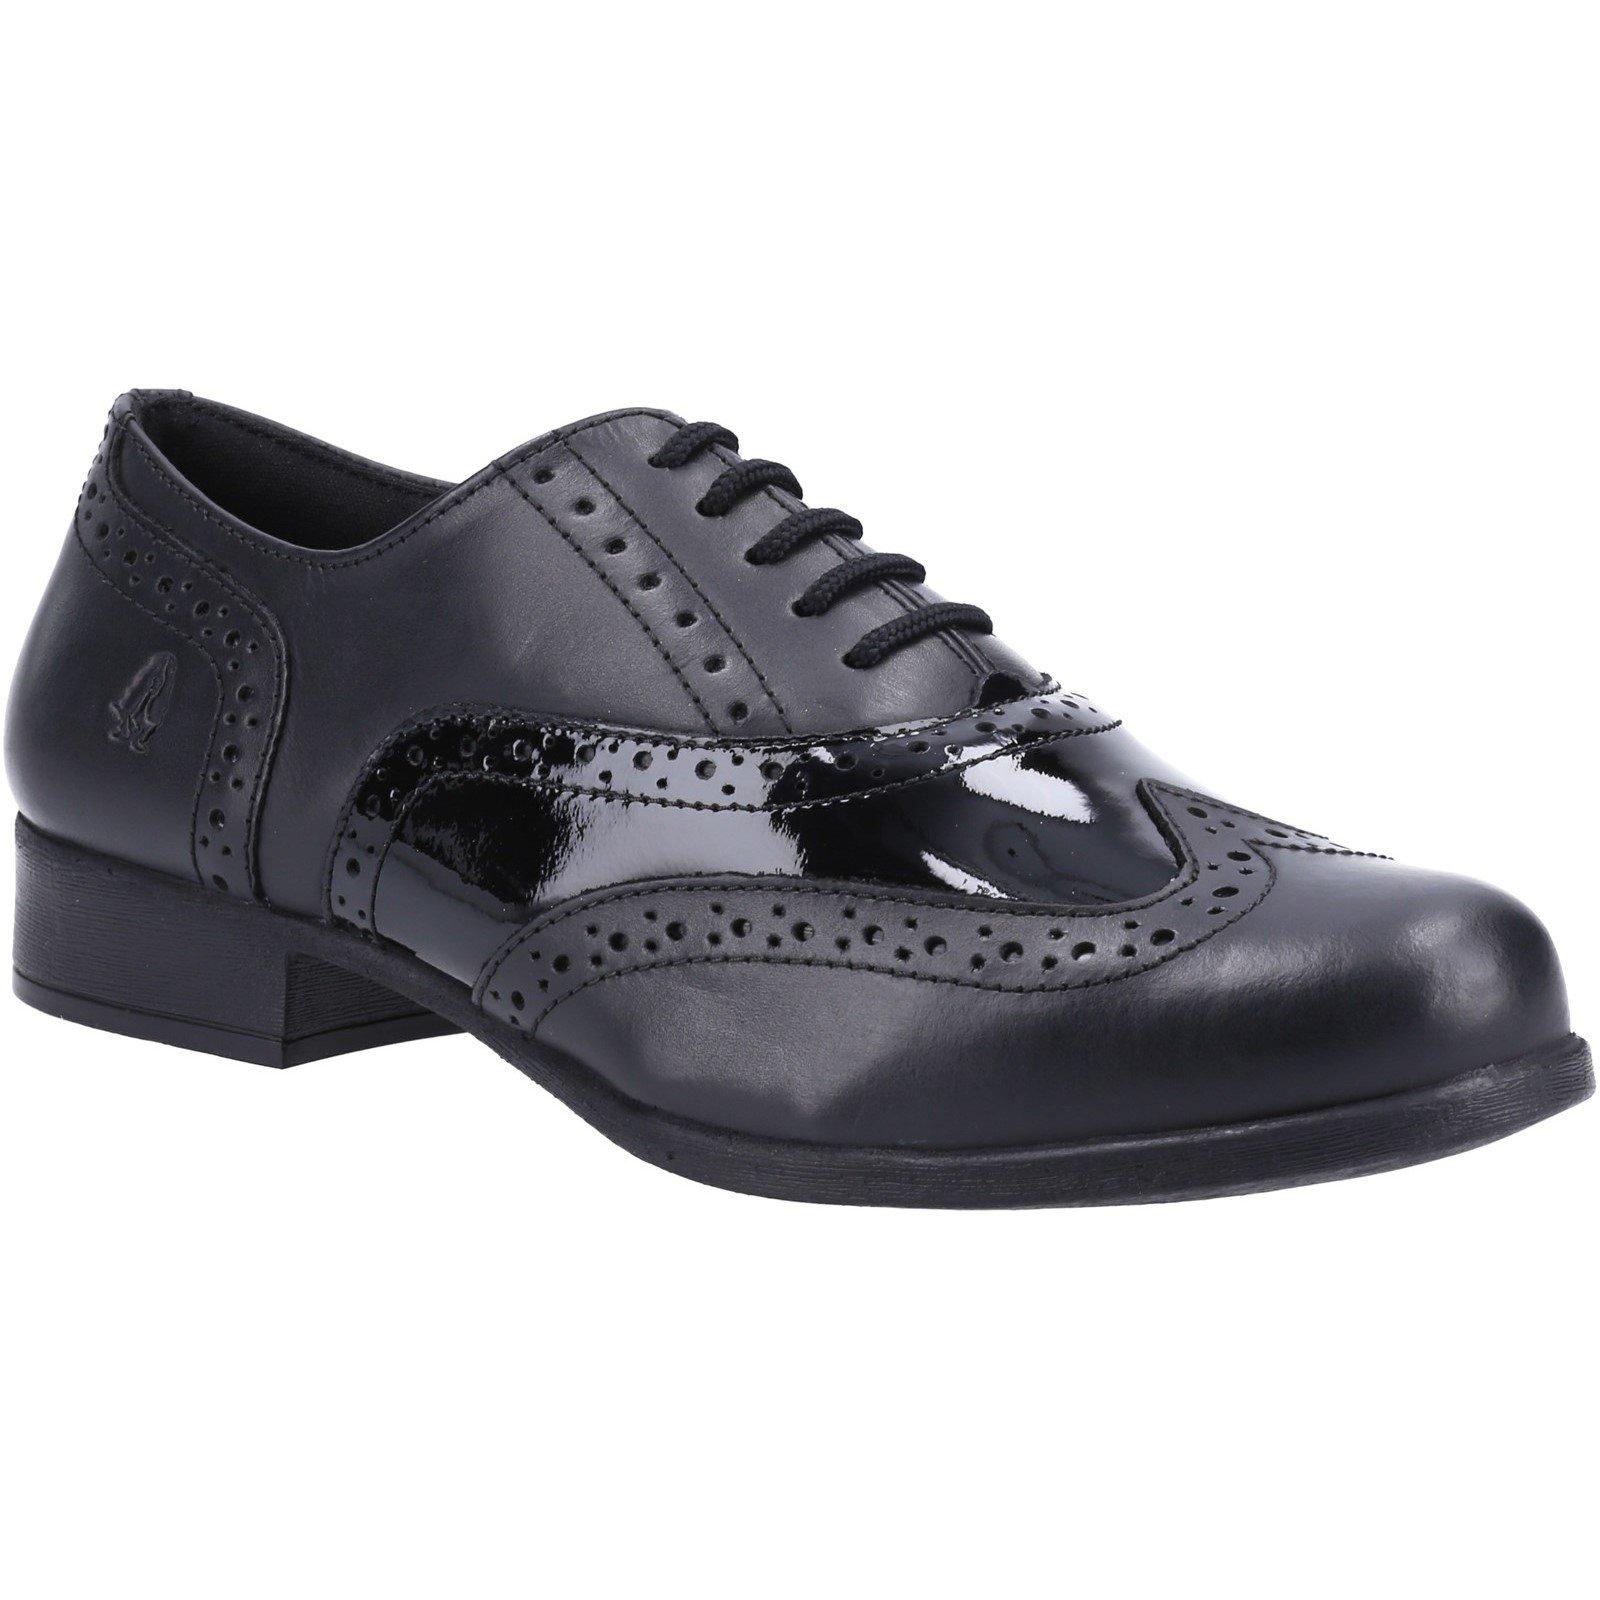 Hush Puppies Kid's Kada Senior School Brogue Shoe Black 33193 - Black 6